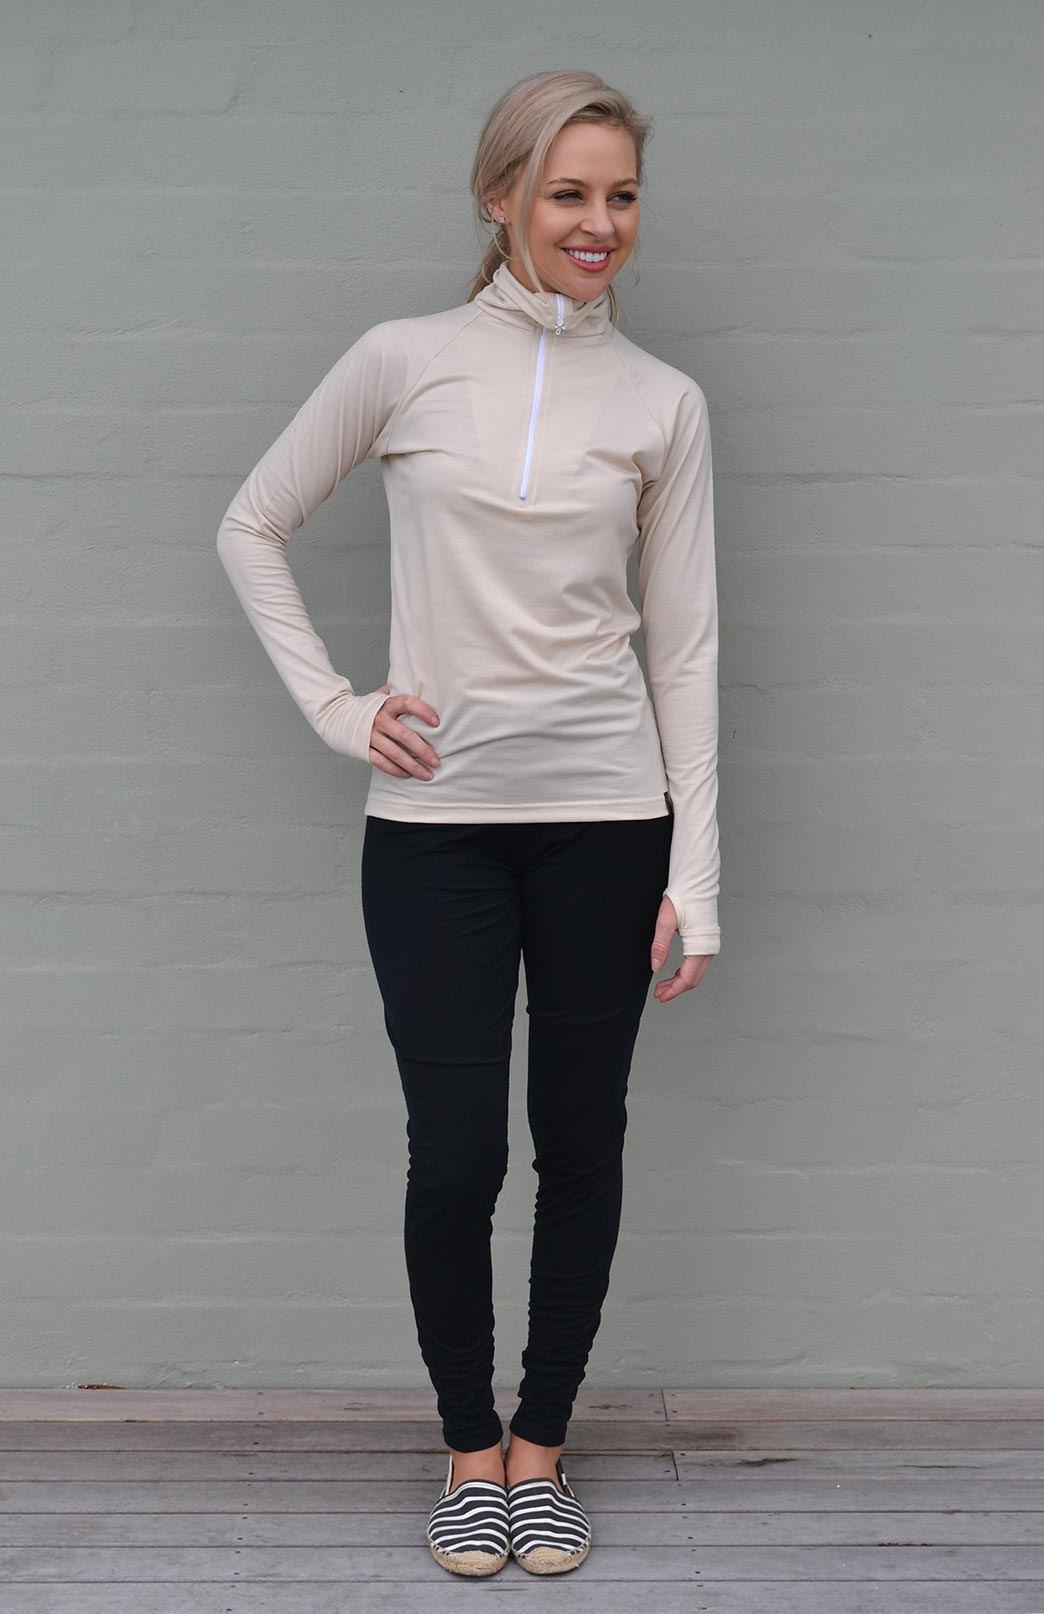 Women's Merino Wool Zip Neck Top - 200g - Smitten Merino Tasmania Australia